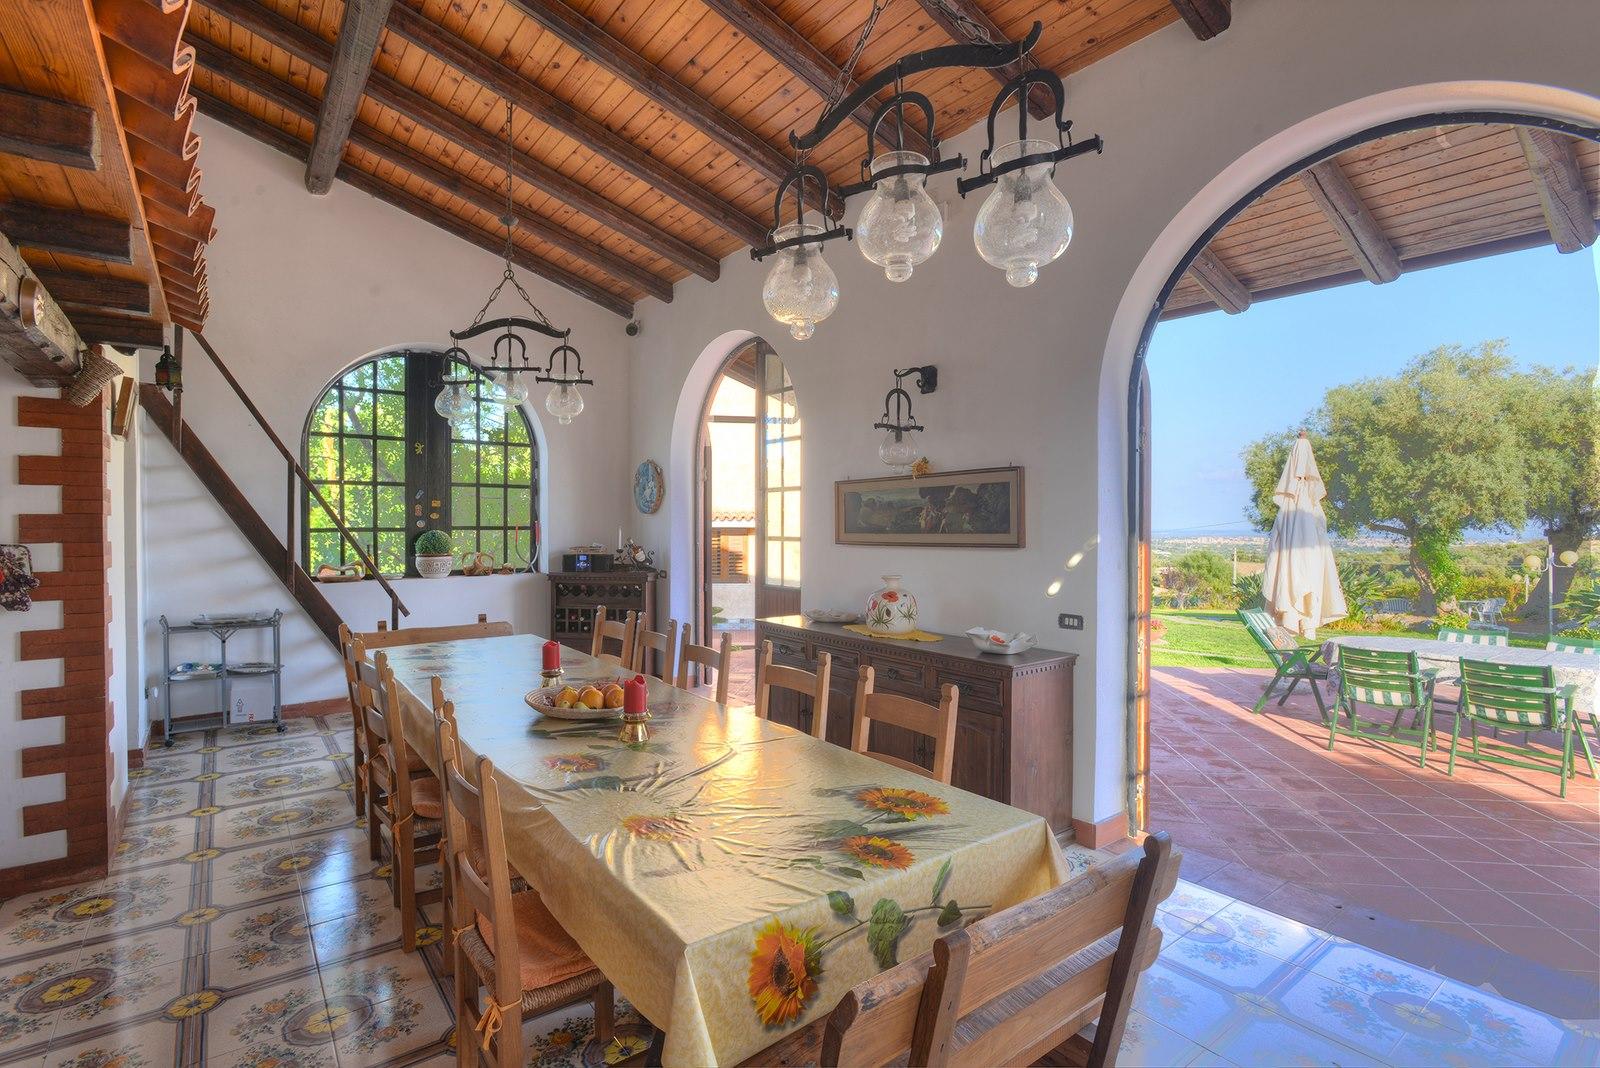 Maison de vacances Villa Casa (1531407), Solarino, Siracusa, Sicile, Italie, image 3